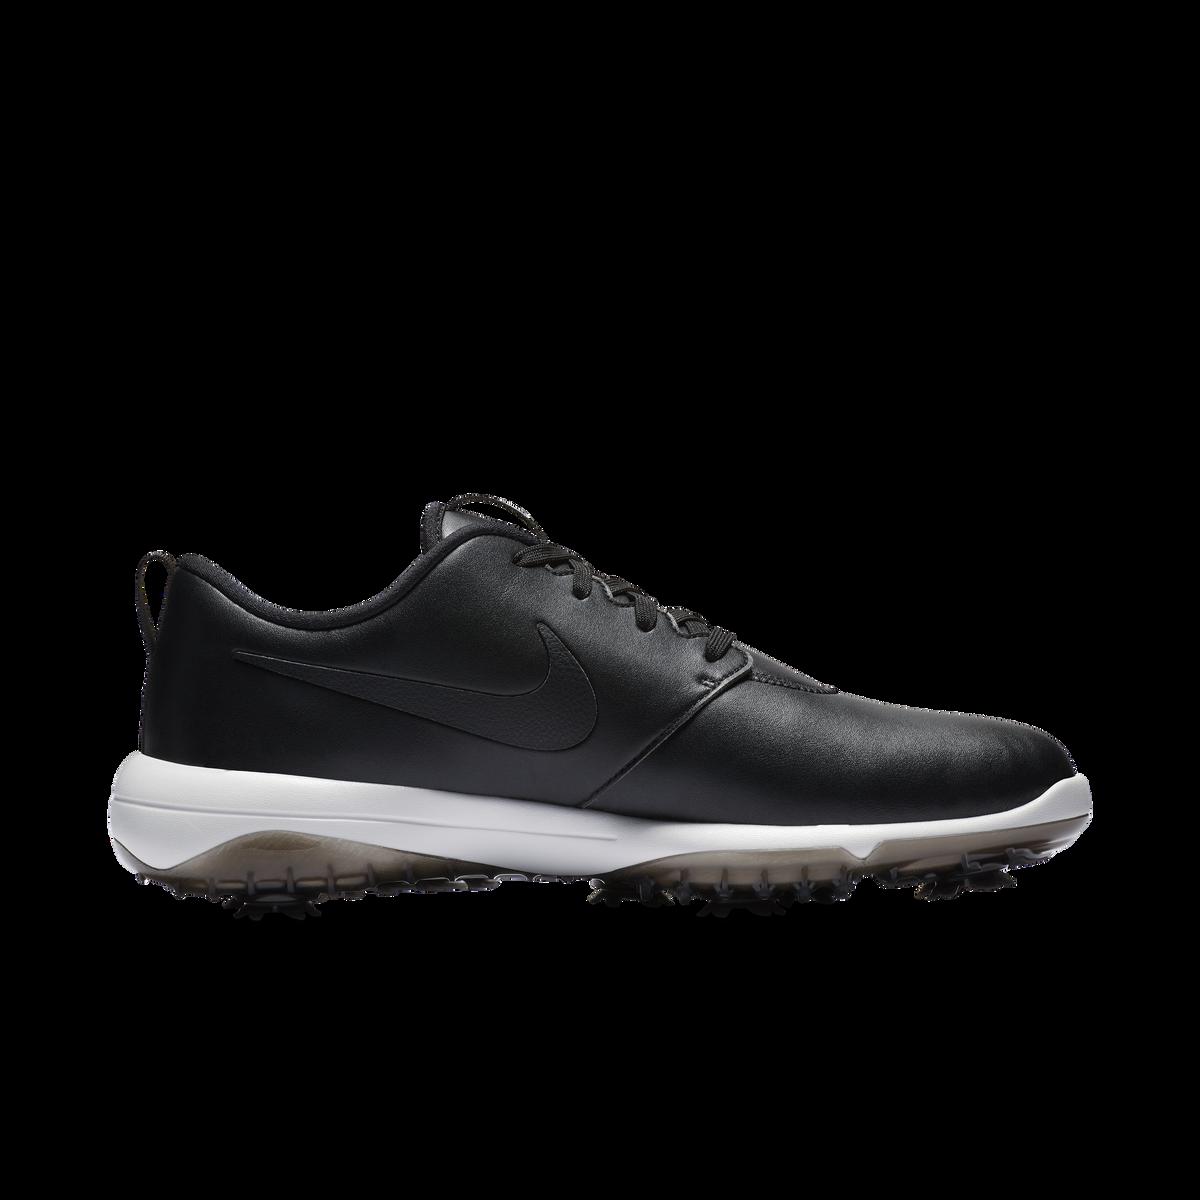 uk availability f4c0e 1bfb4 Images. Nike Roshe G Tour Men  39 s Golf Shoe - Black